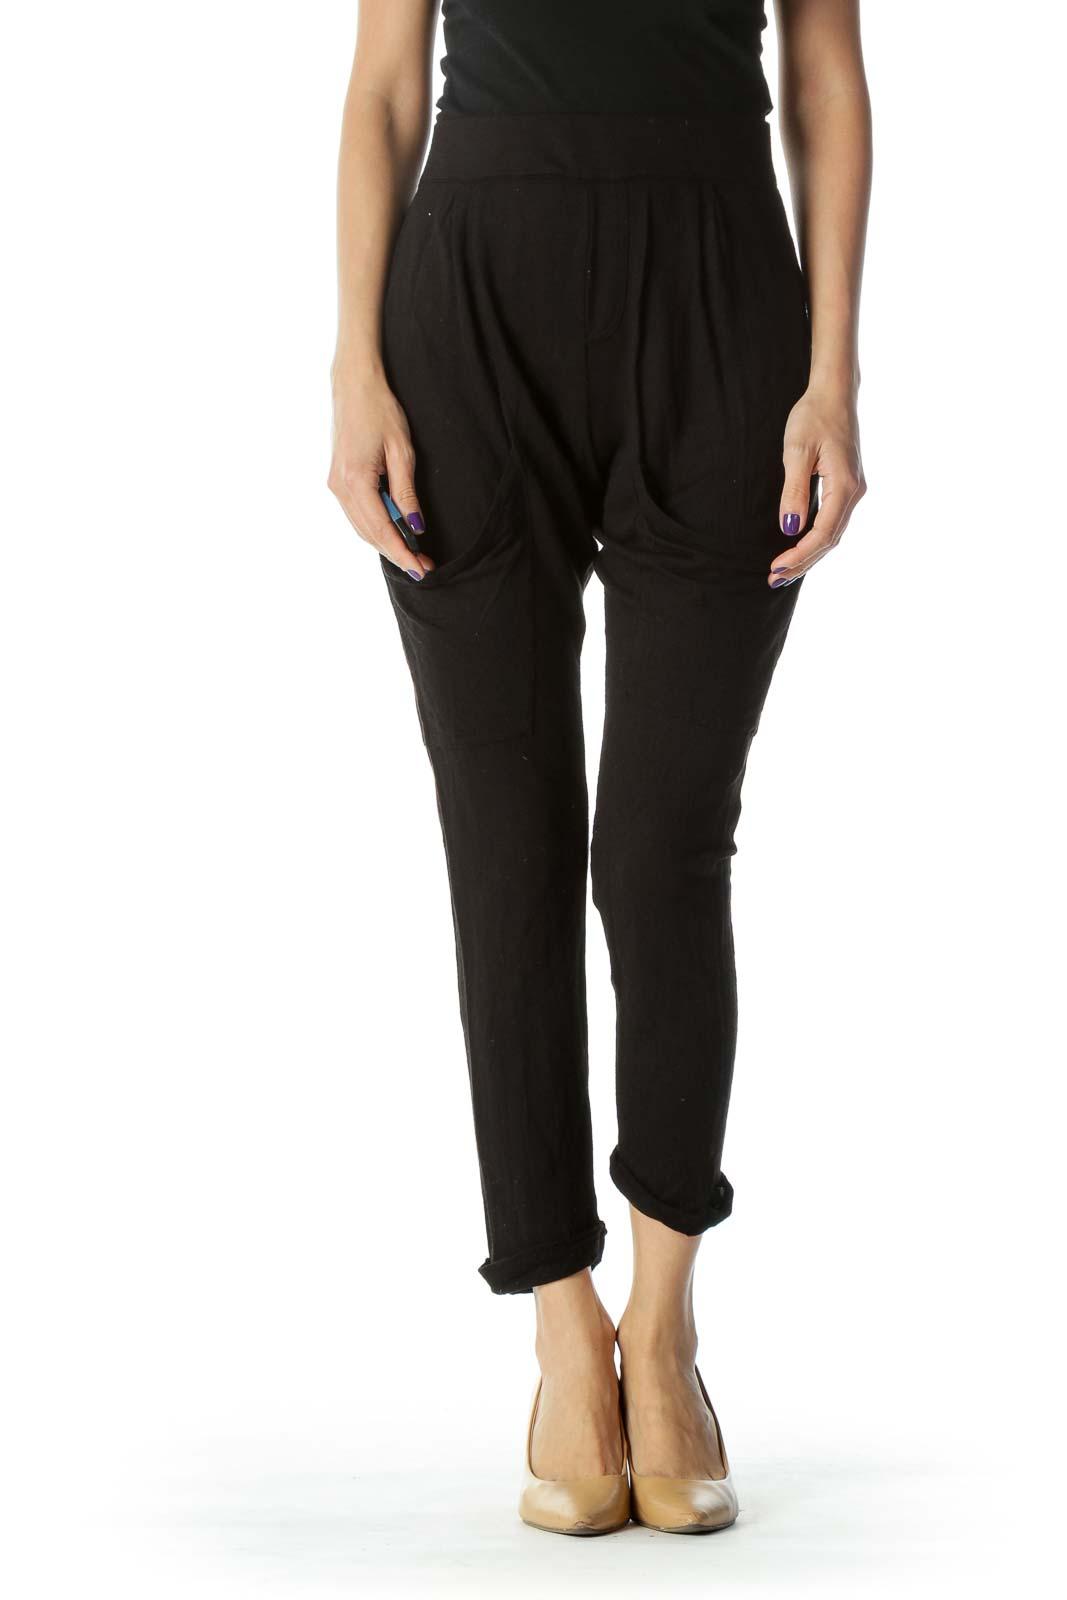 Black Slim Fit Dropped Pocket Cropped Pant Front